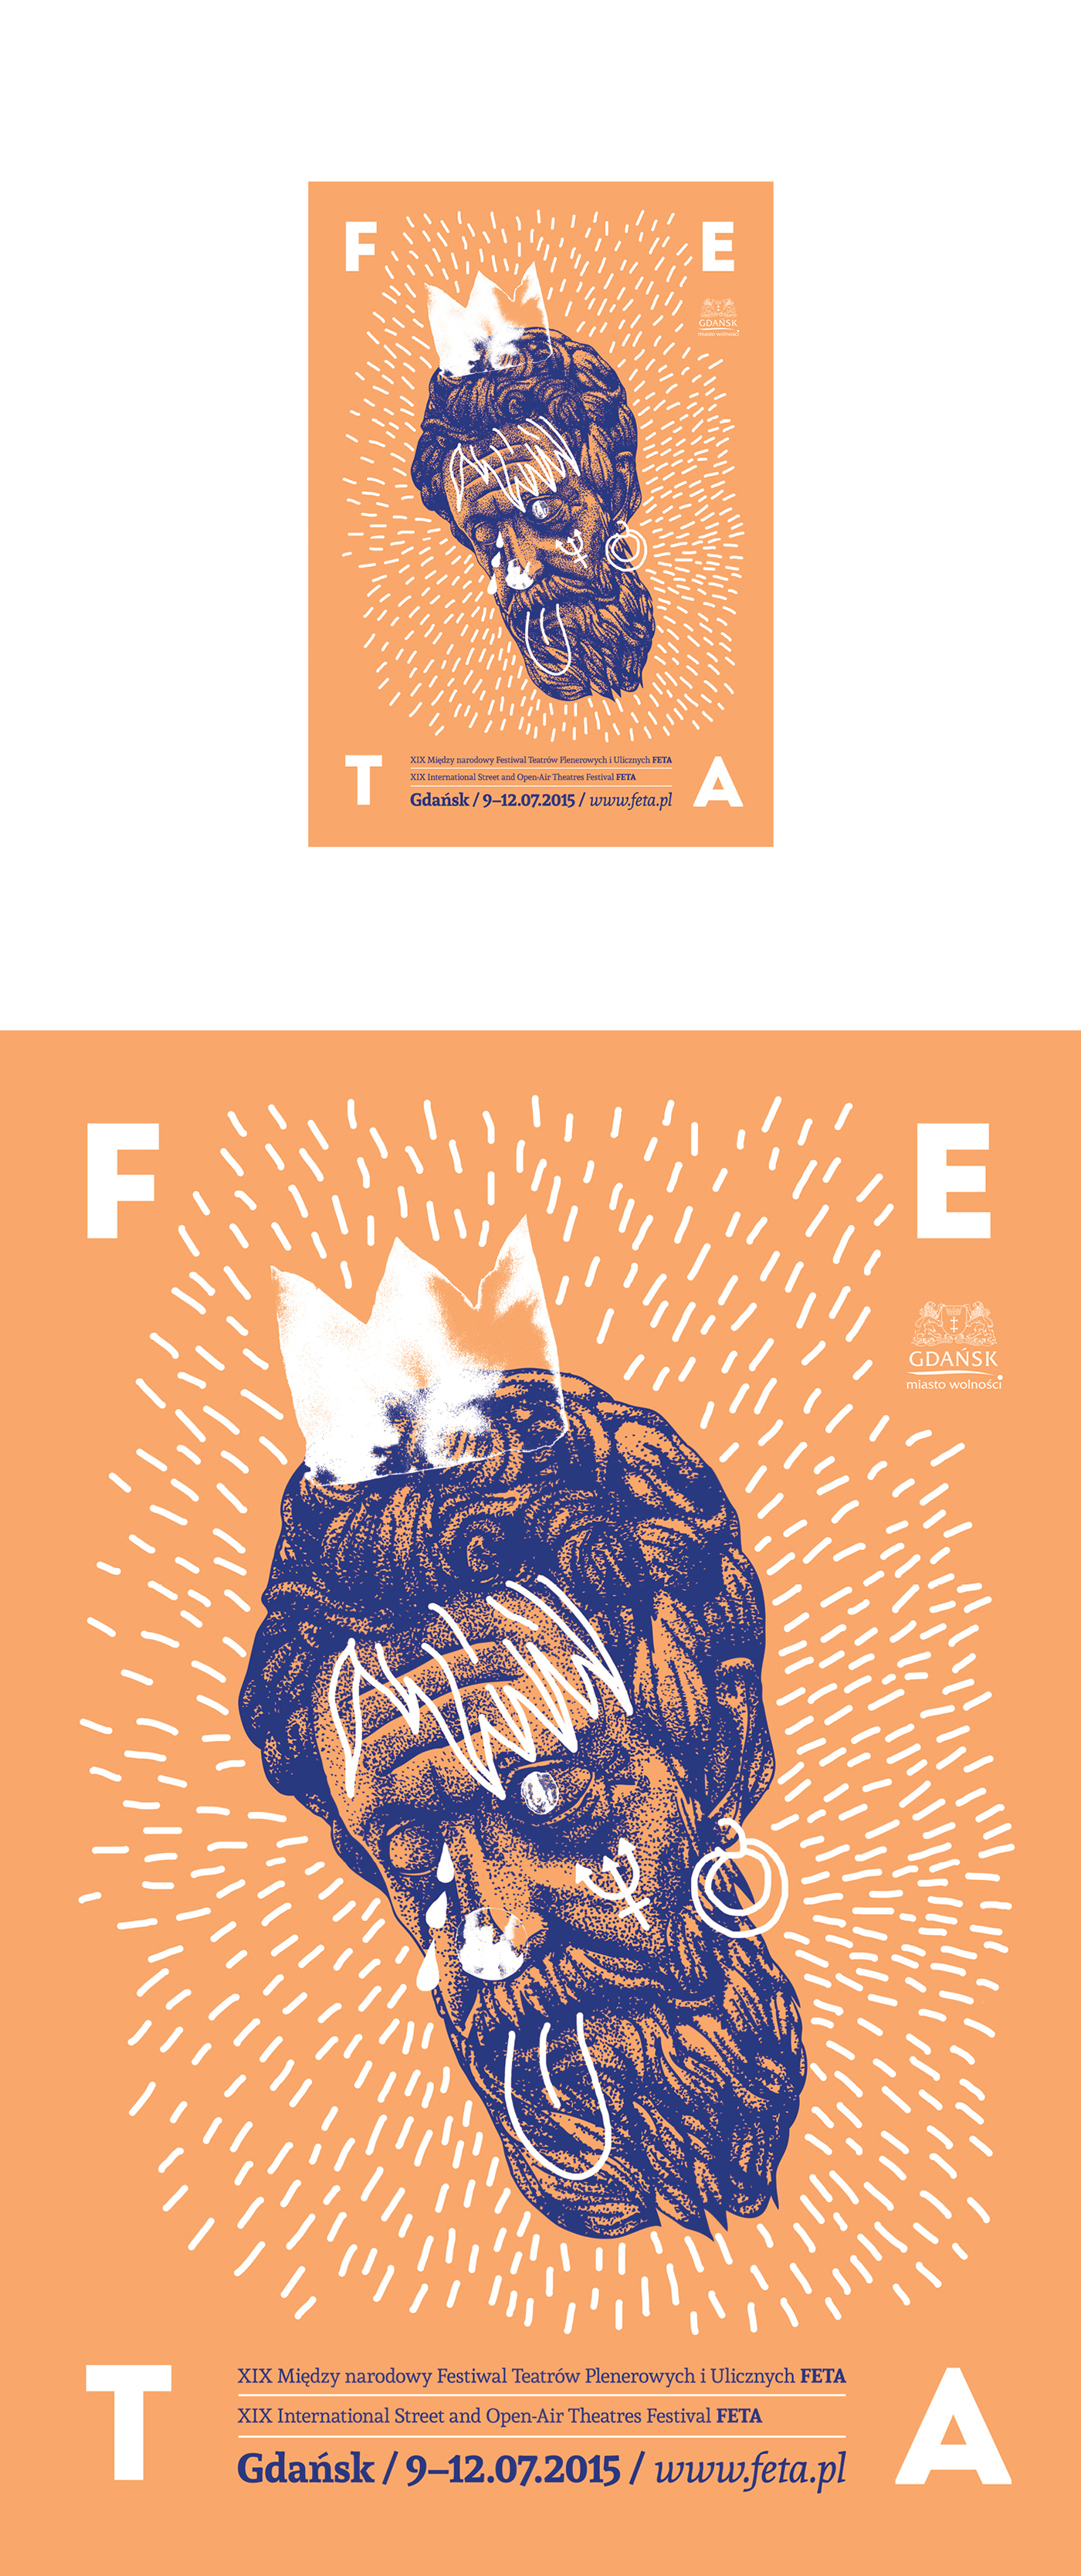 poster plakat Theatre festival Gdansk neptun neptune poseidon posejdon ilustracja